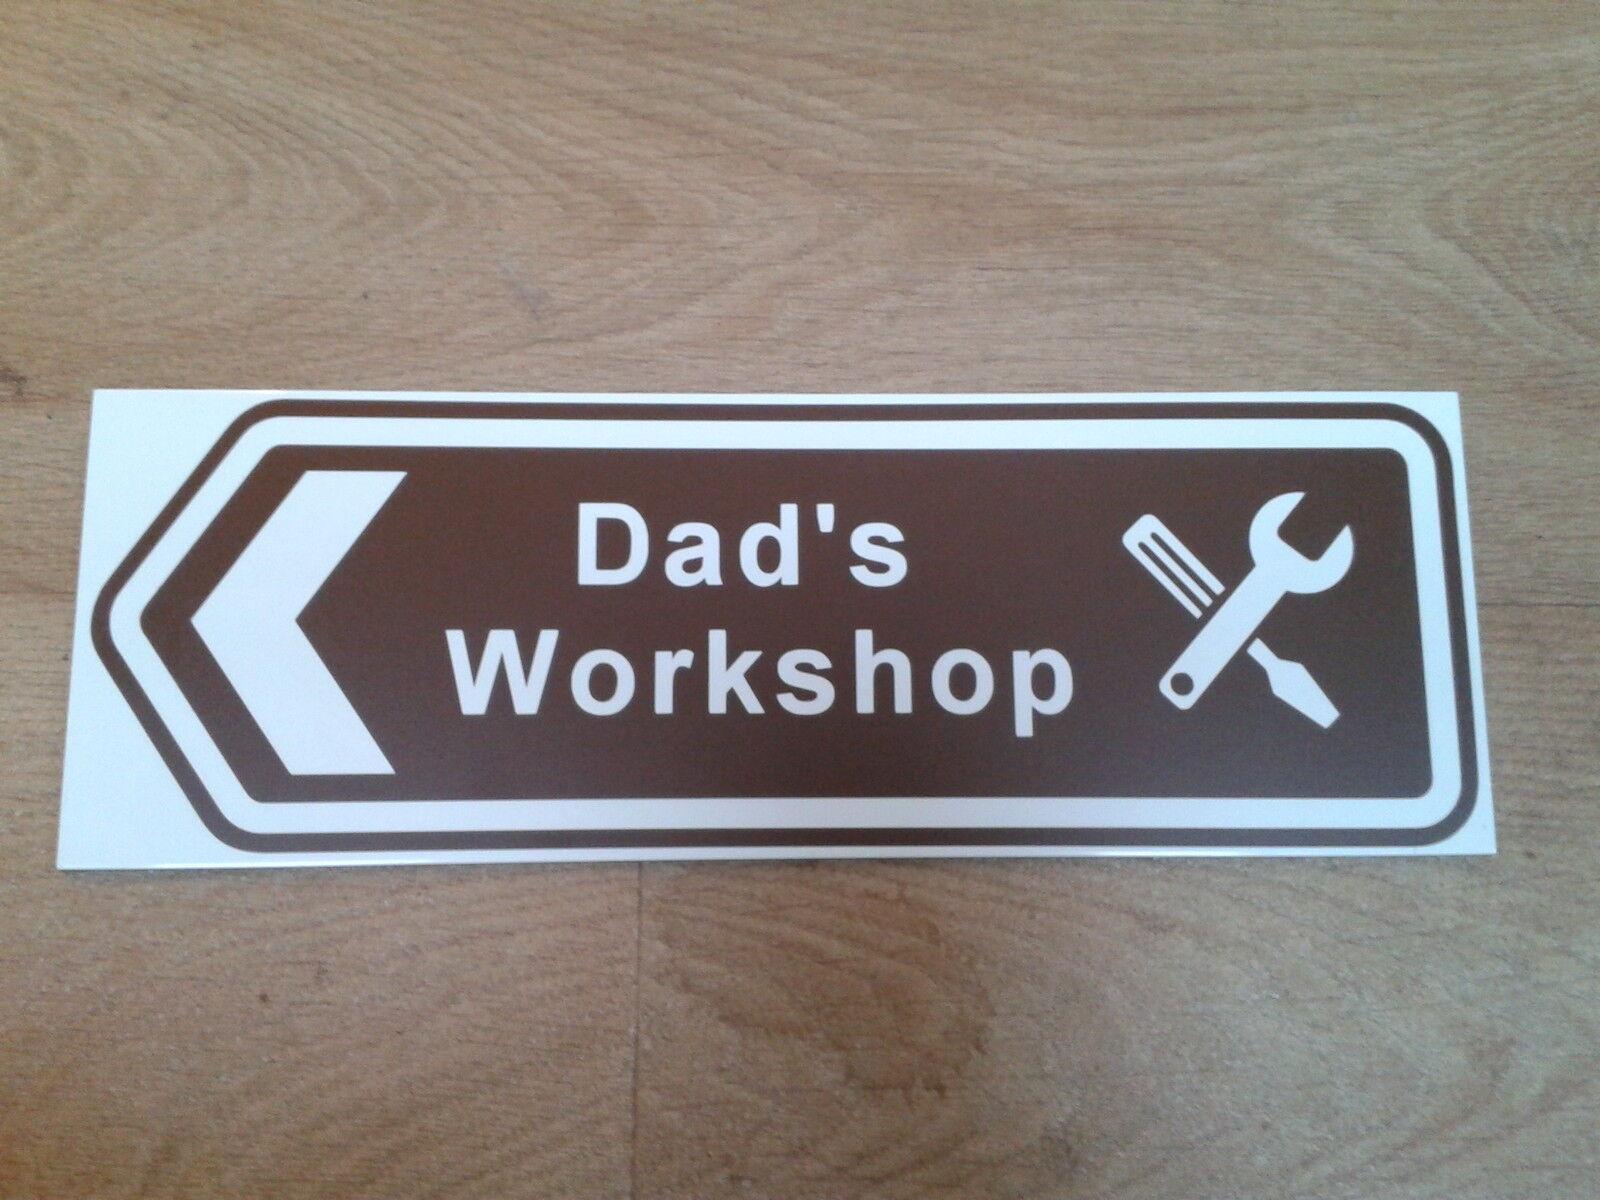 Ride on Railways -  Dad's Workshop  brown arrow sign